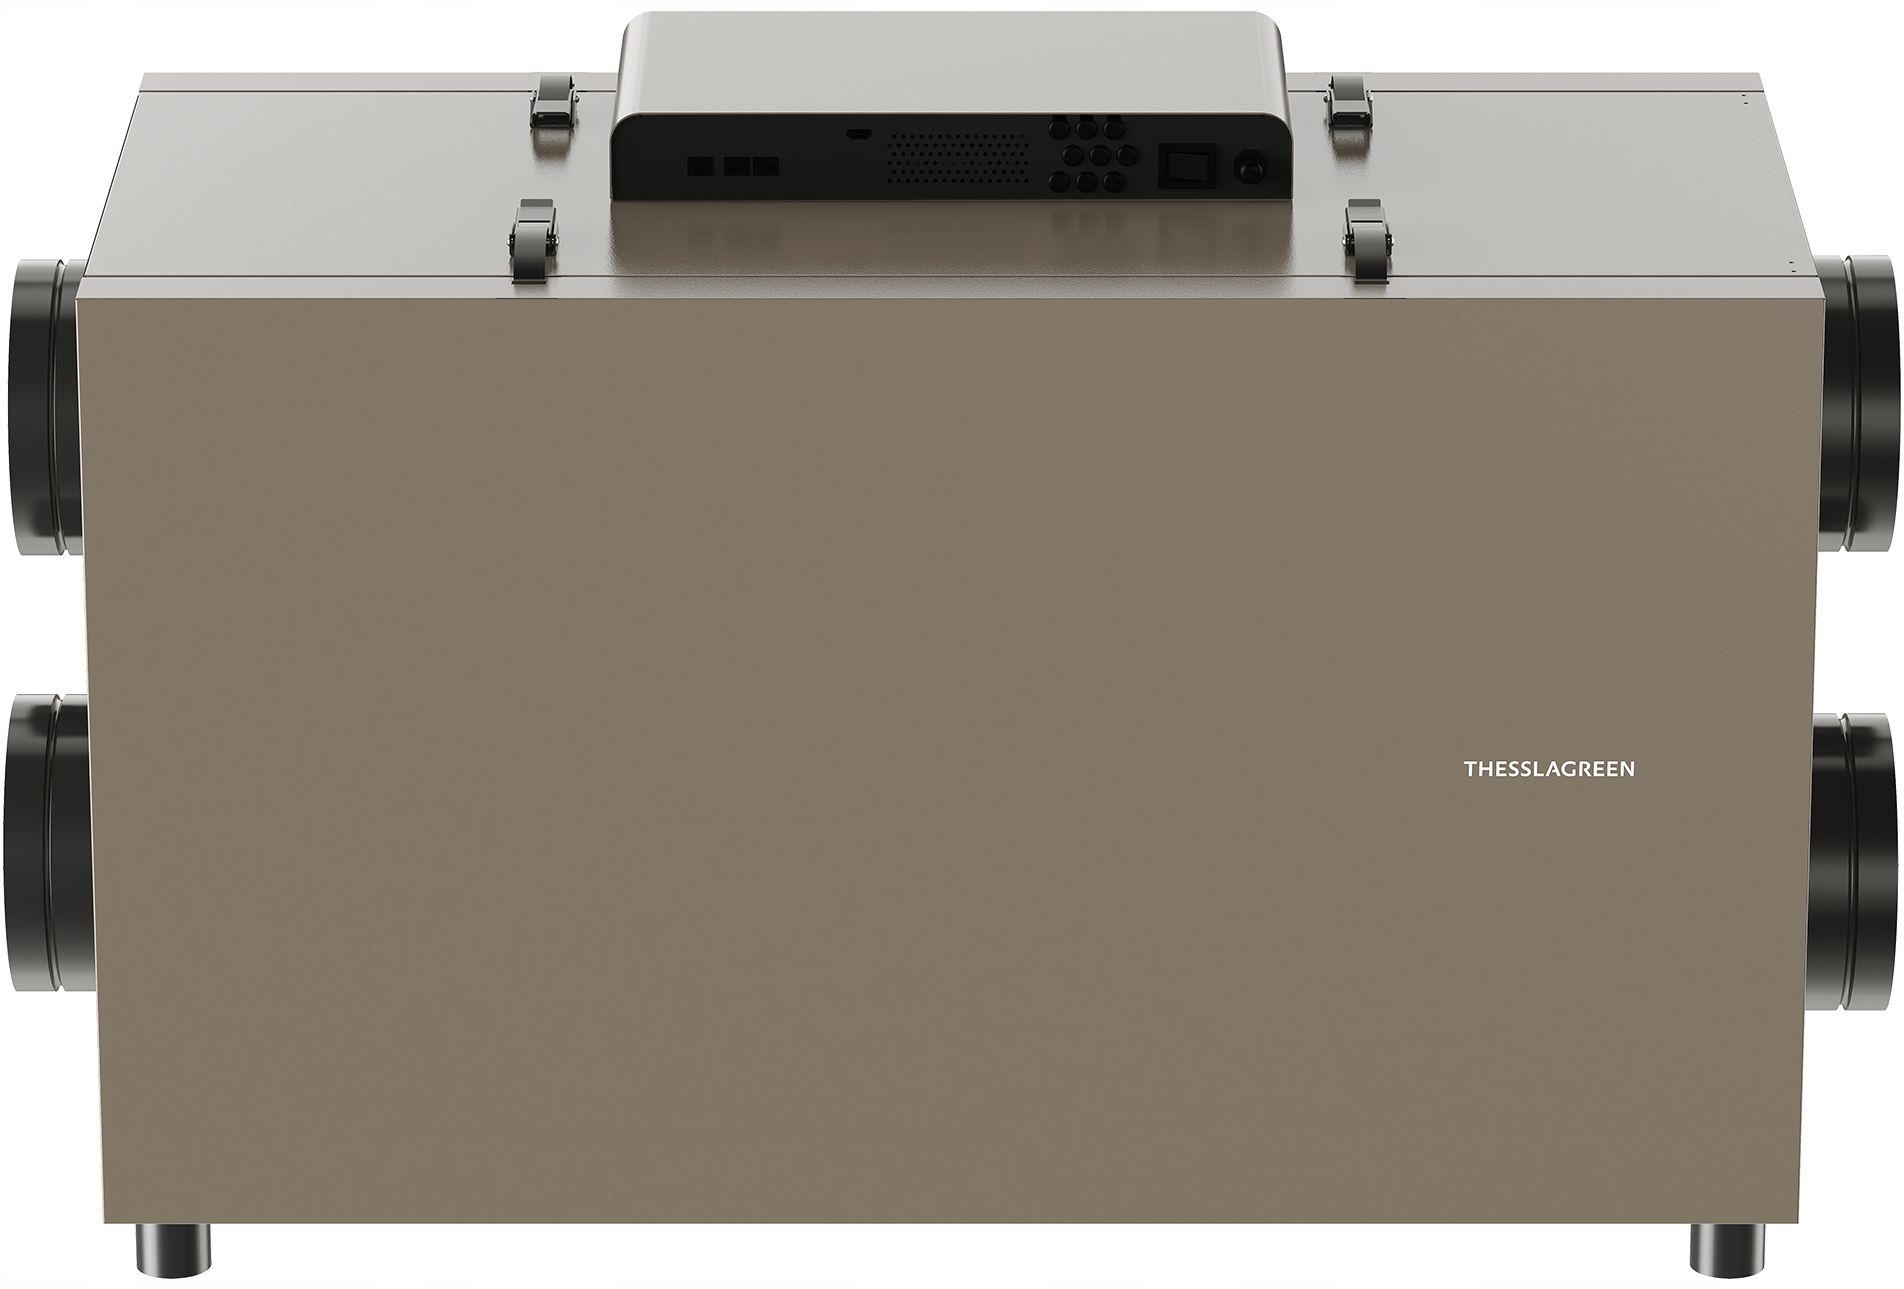 Rekuperator Thesslagreen AirPack Home 500h Energy Centrala Tesla rekuperator Home 500H